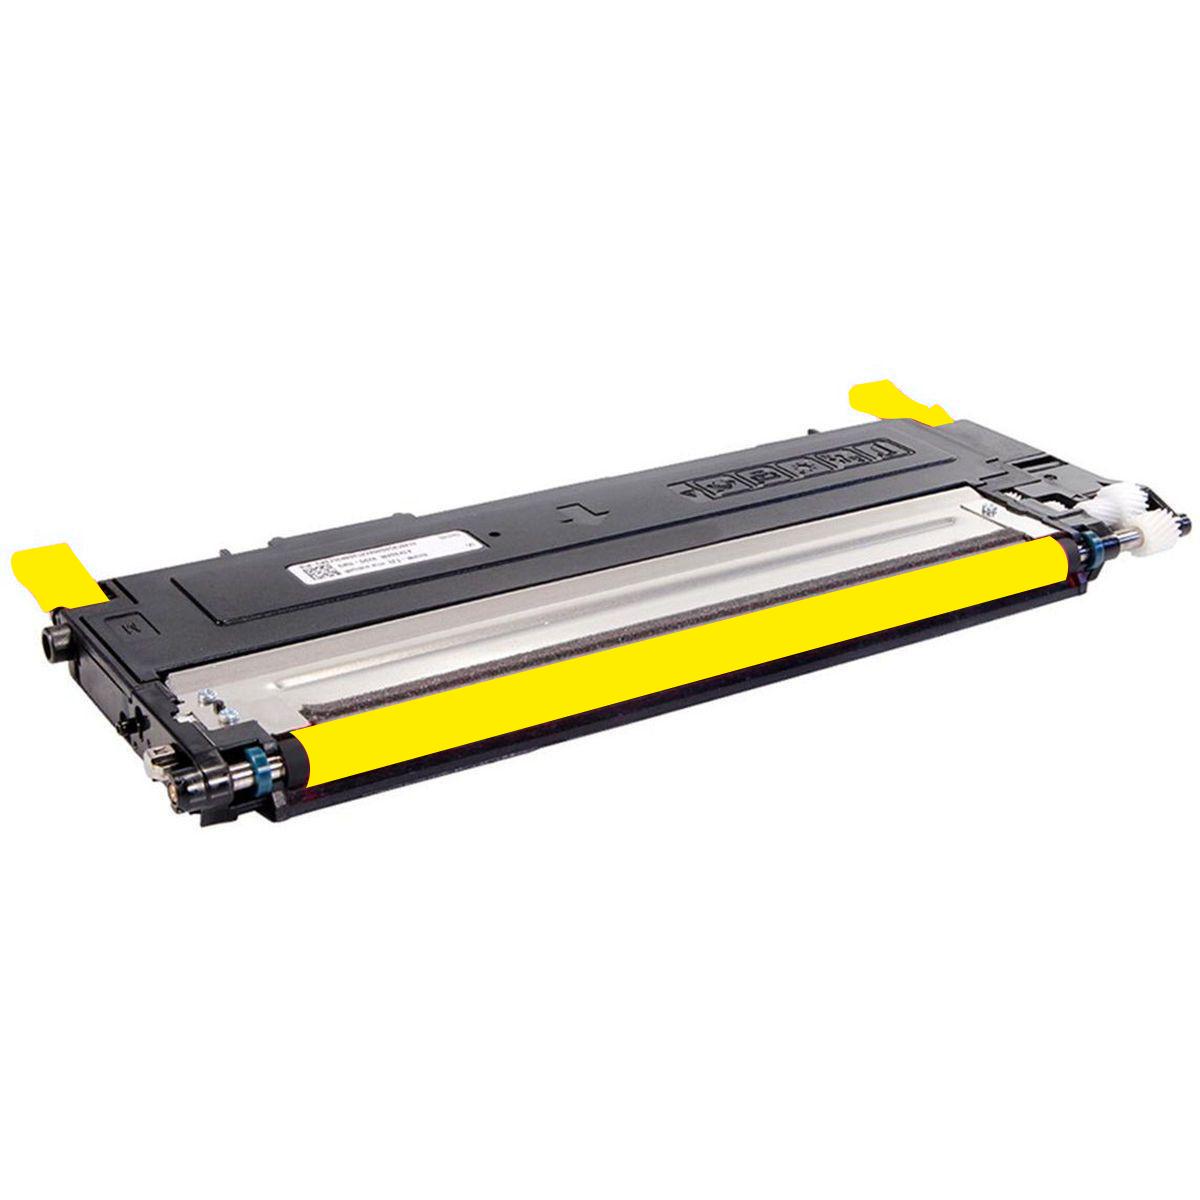 Toner Compatível HP BQ - CLT Y 407 I Y 409 - Yellow